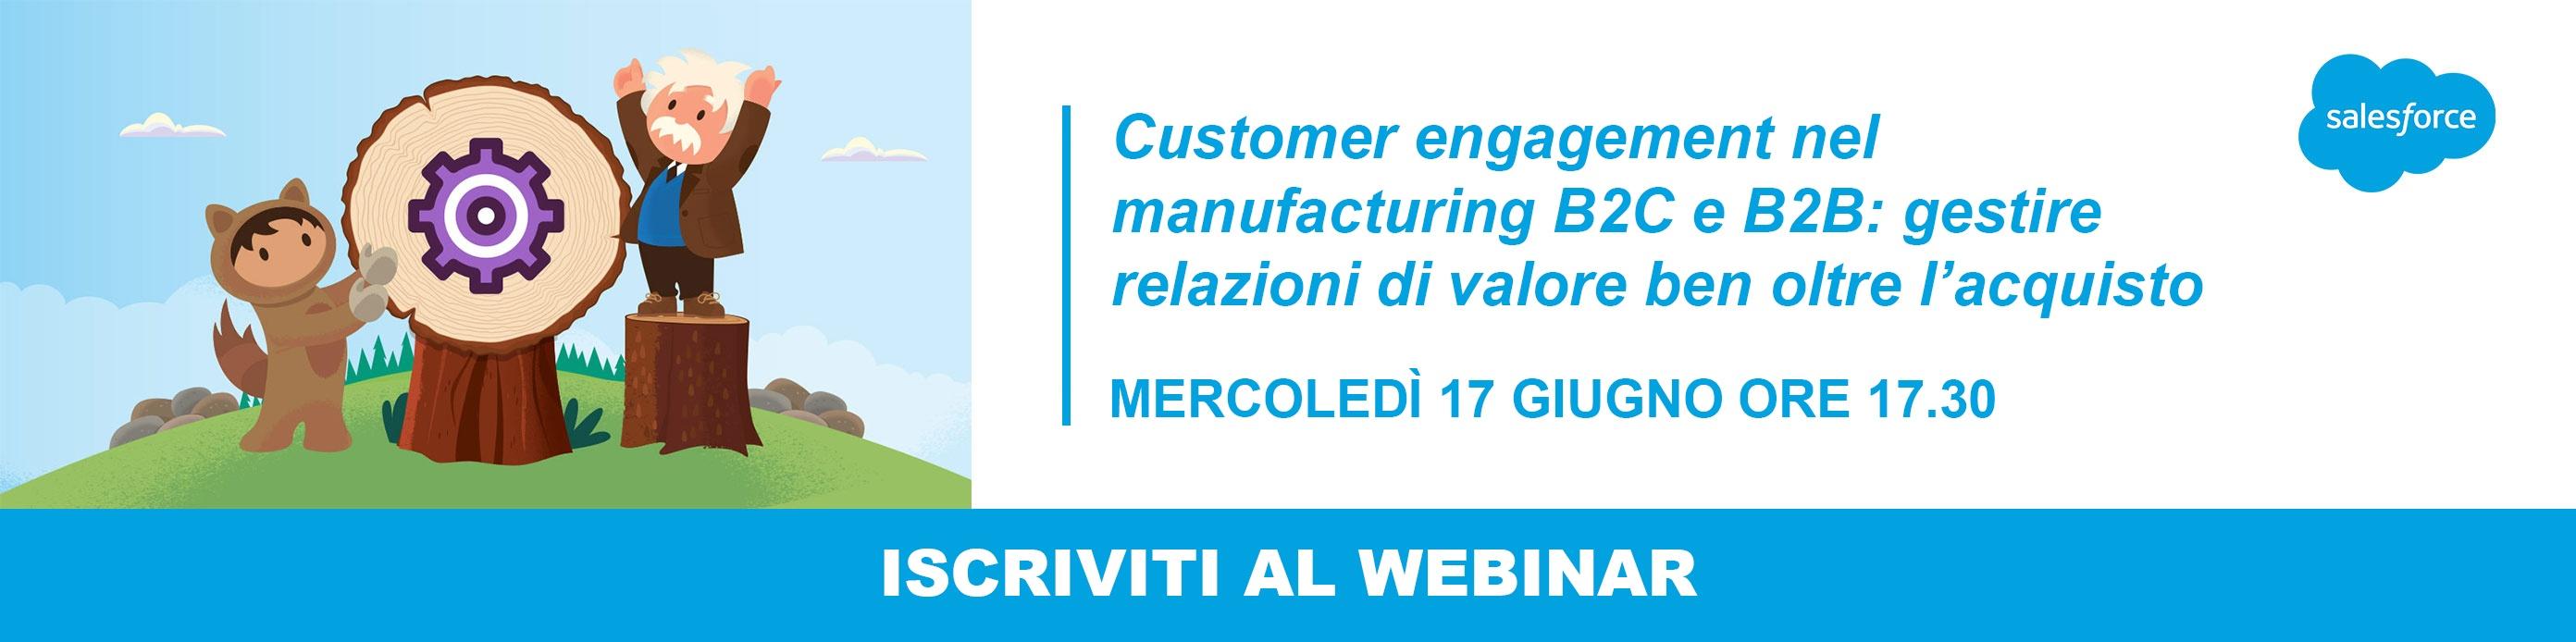 Customer Engagement nel manufacturing B2C e B2B - 17 giugno - Iscrivit